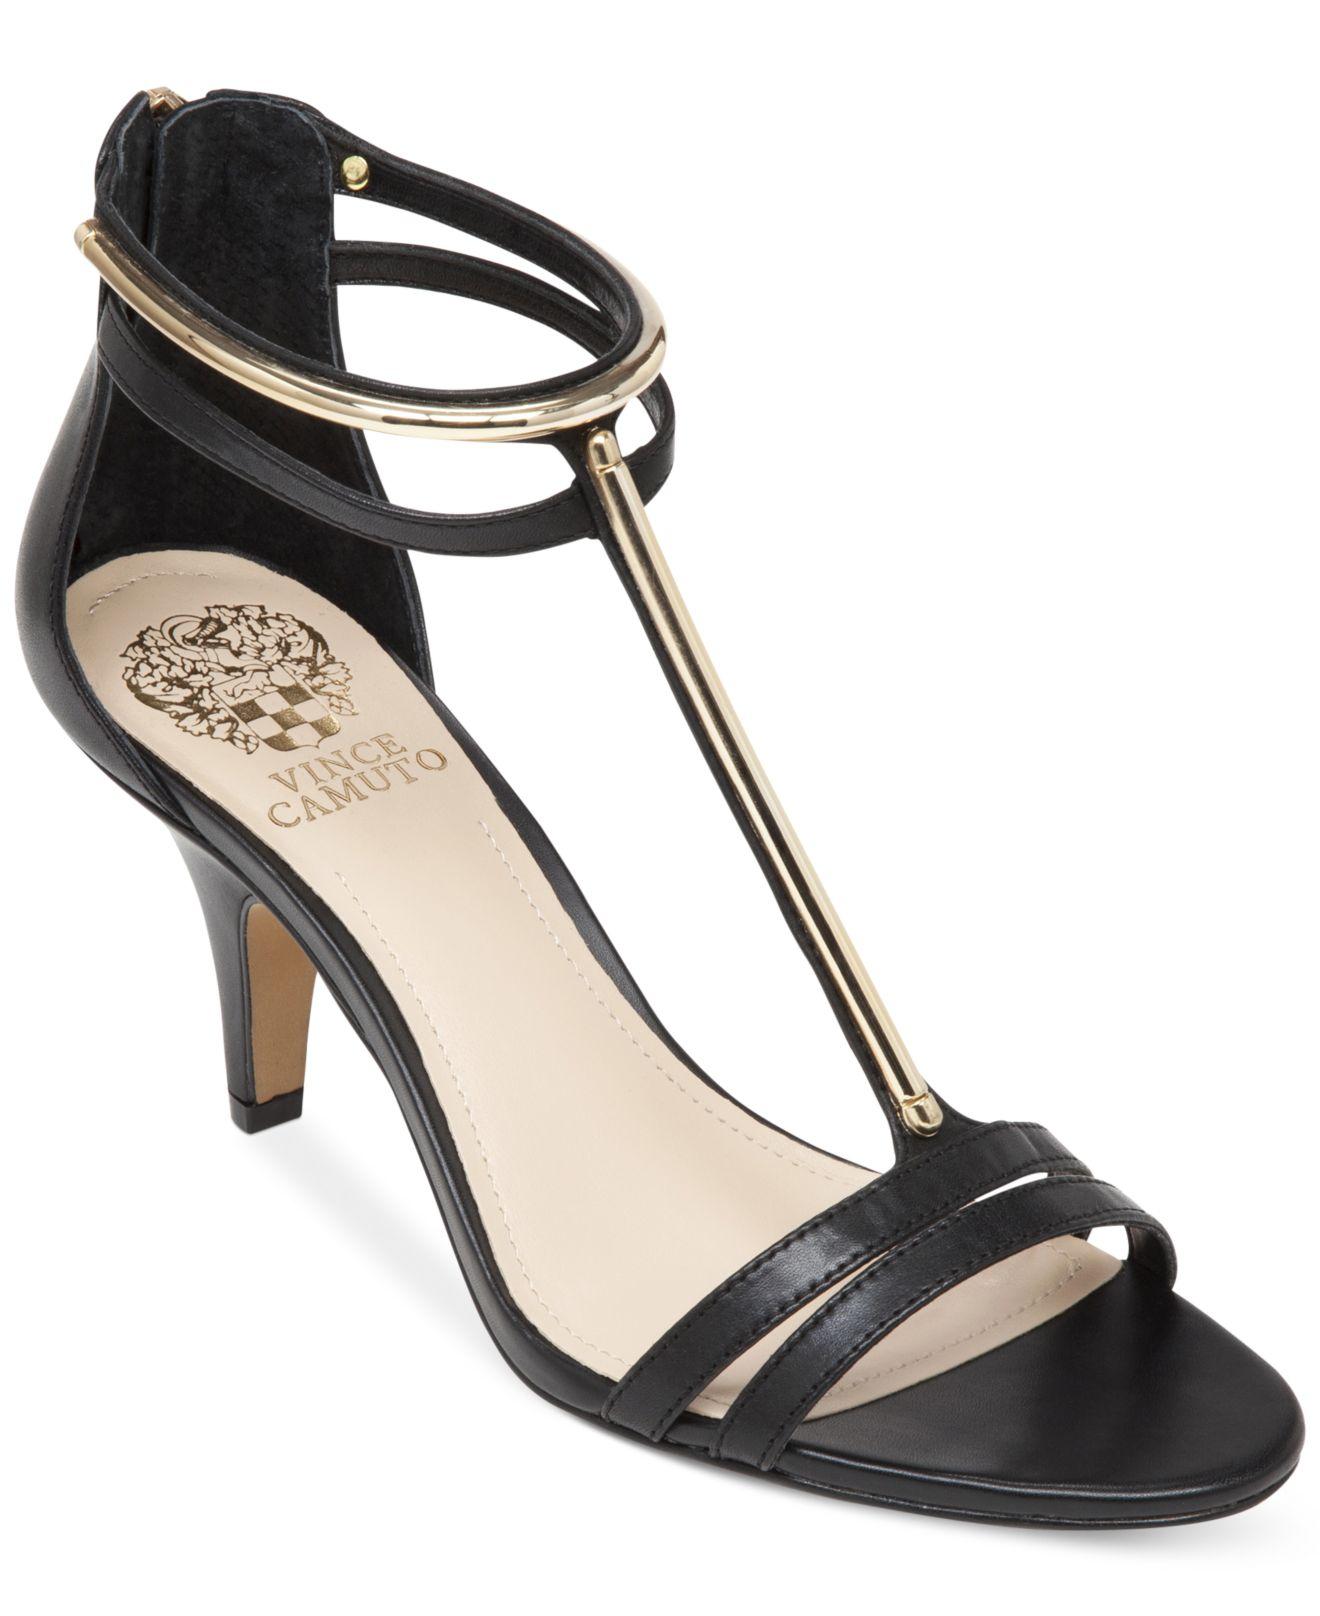 Vince Camuto Shoes Black Heels